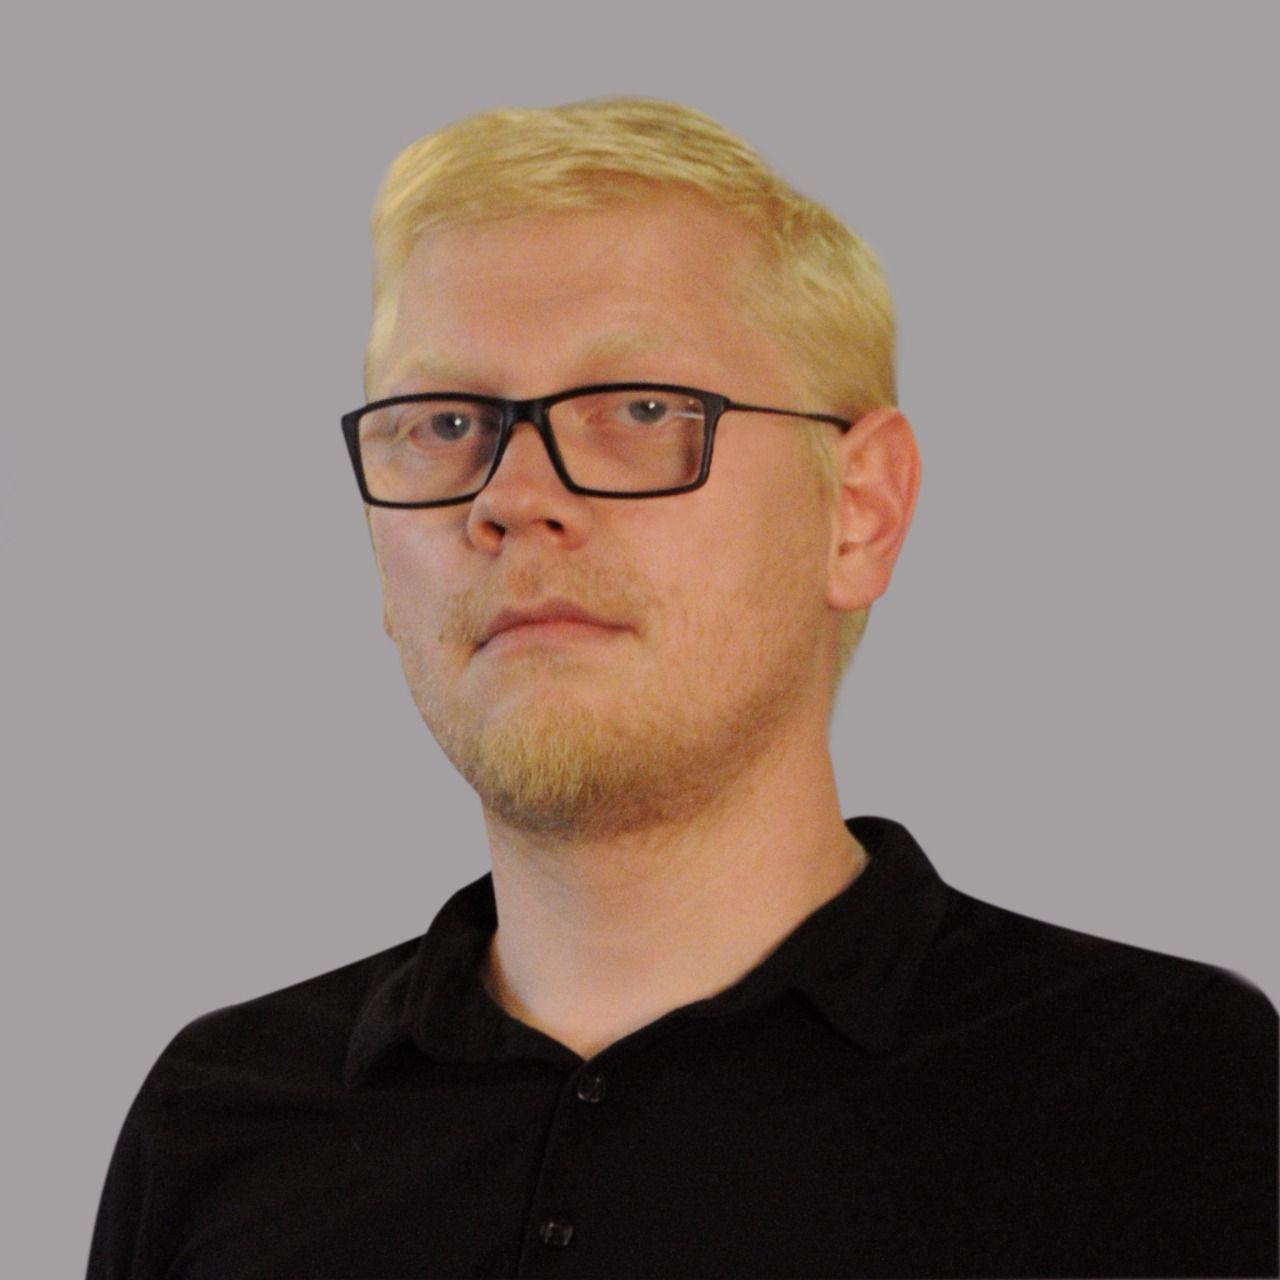 Михаил Бударагин, обозреватель